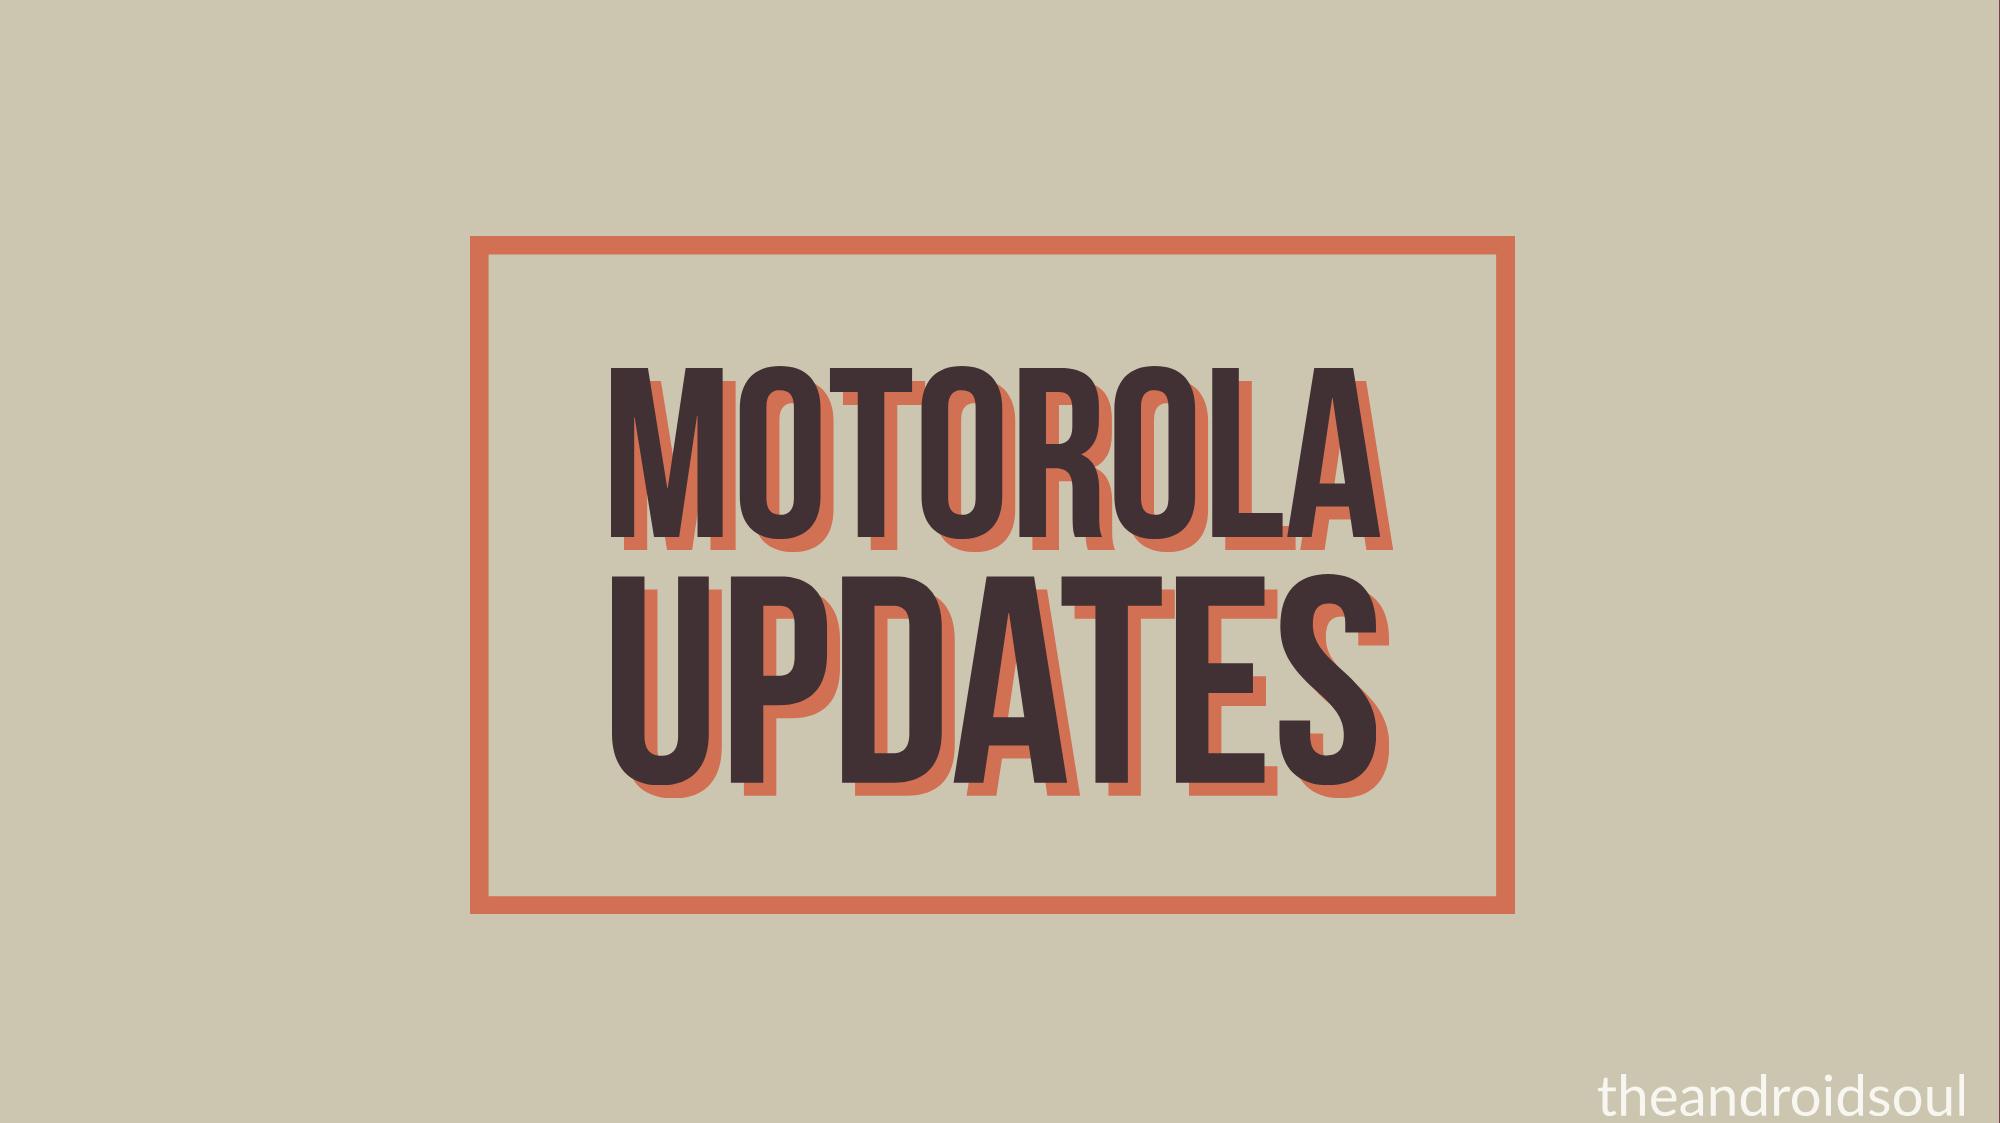 Motorola releases new updates for Moto z2 play, One, x4, z2